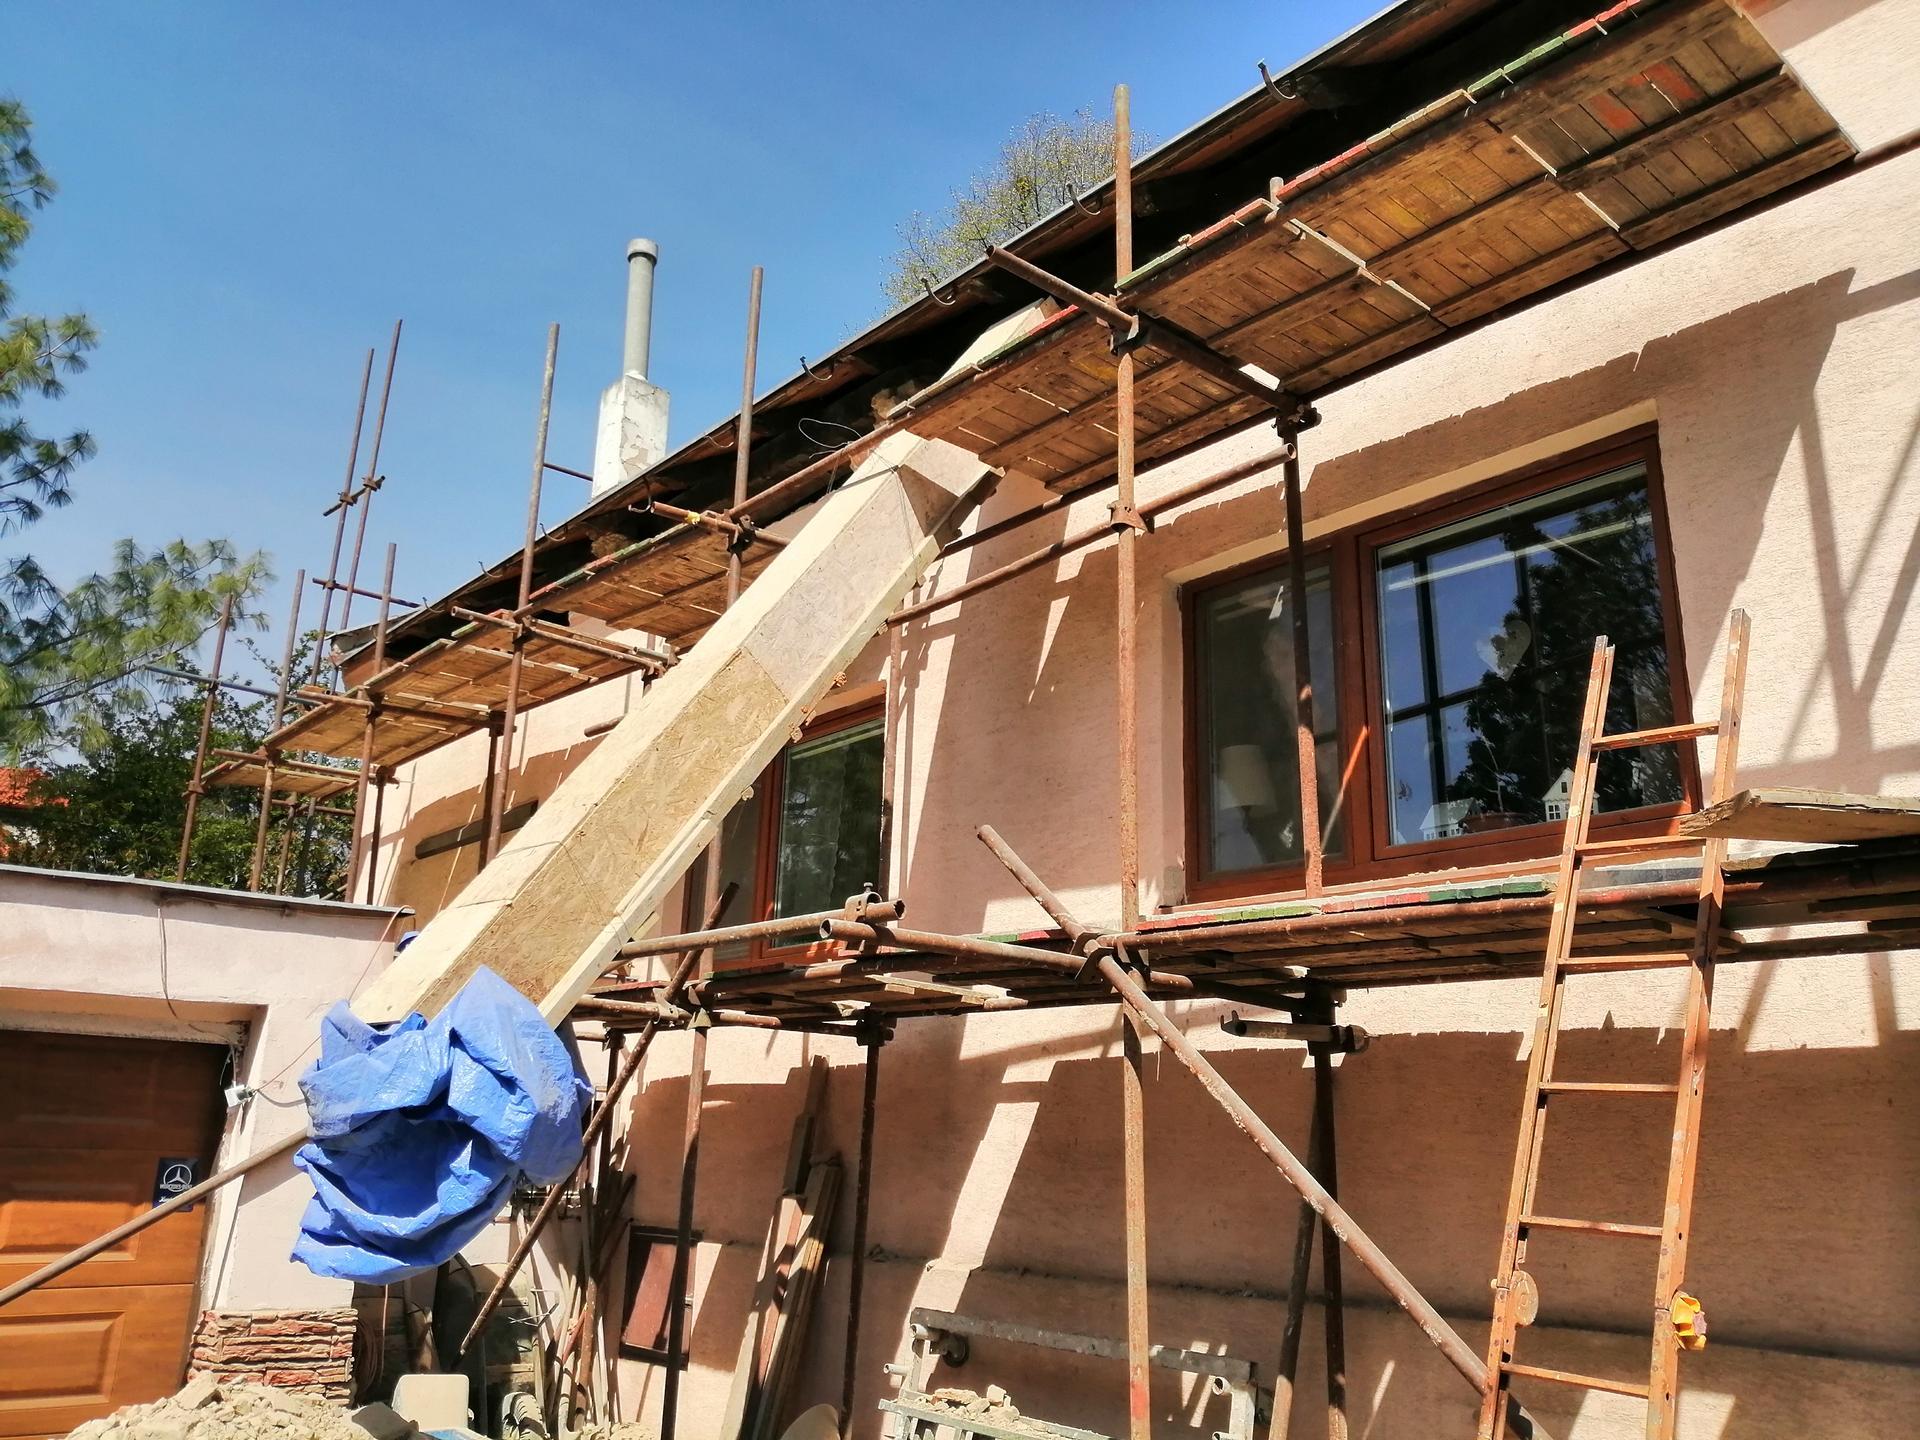 Prestavba podkrovia zo sedlovo valbovej na sedlovú strechu. - Obrázok č. 40